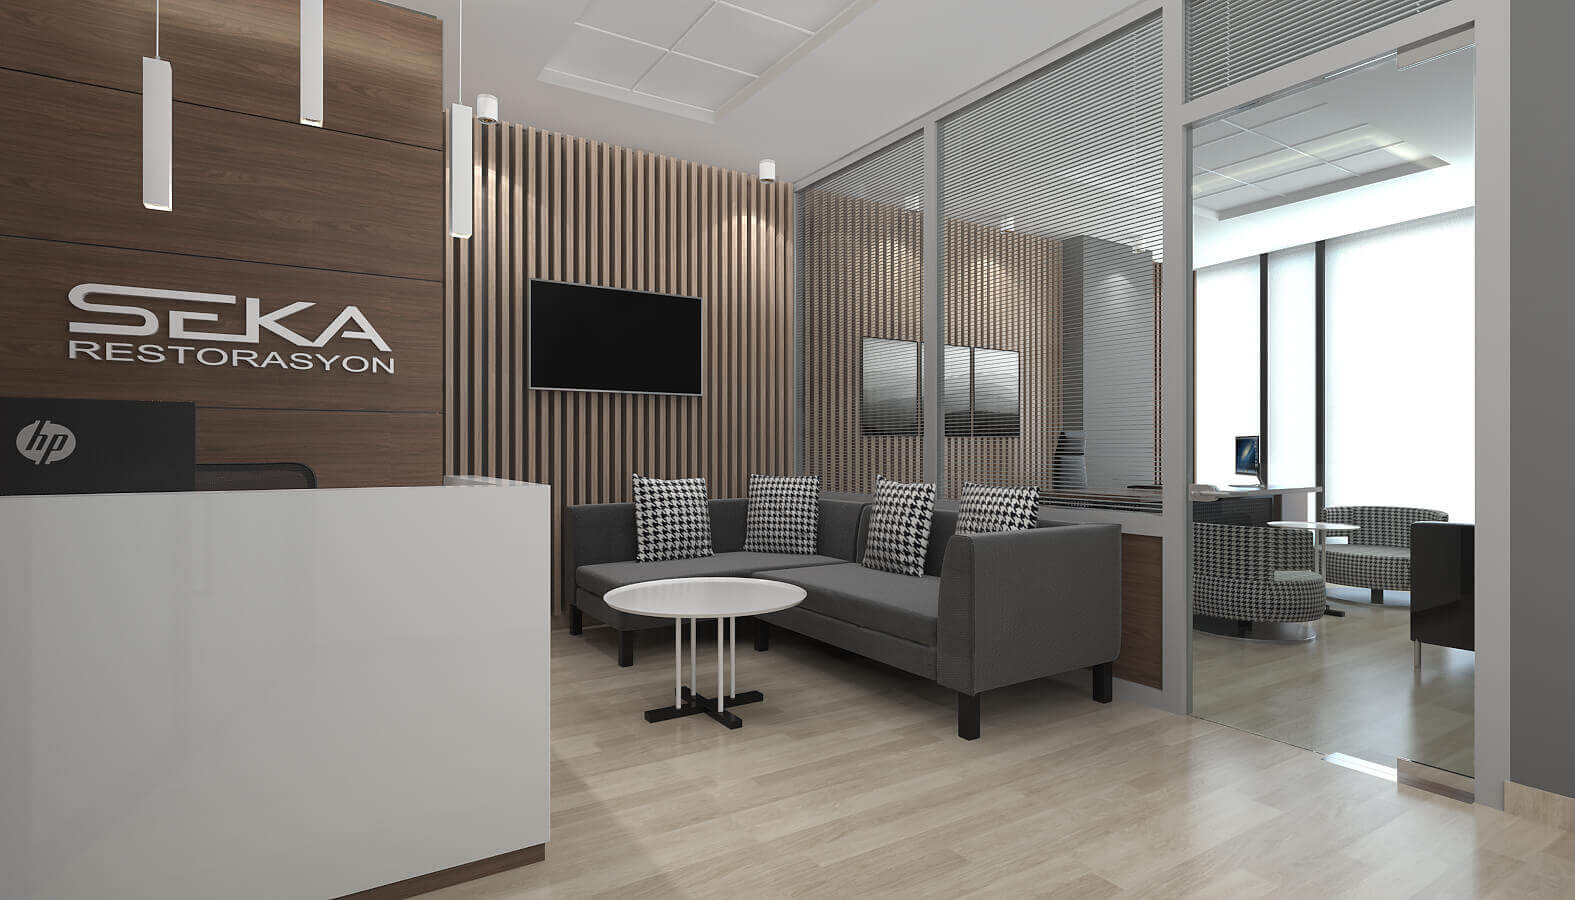 ofis içmimari 3765 Seka Restorasyon Ofisler